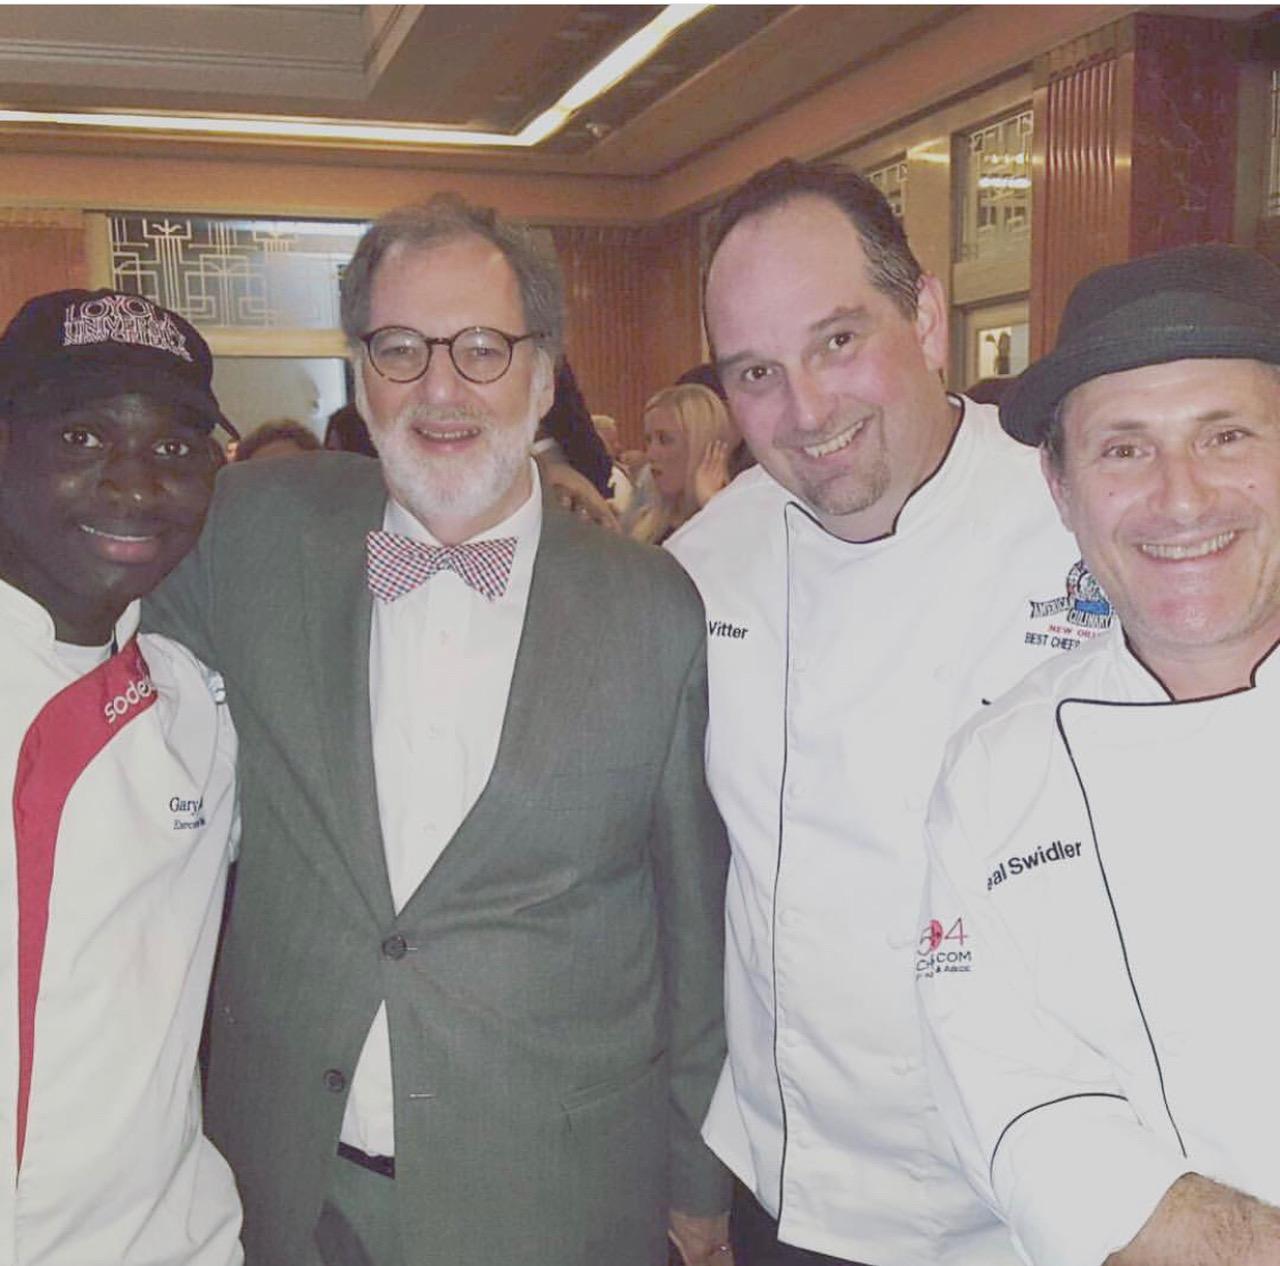 Tom Fitzmorris, Chef Drue Vitter, and Chef Neil Swidler